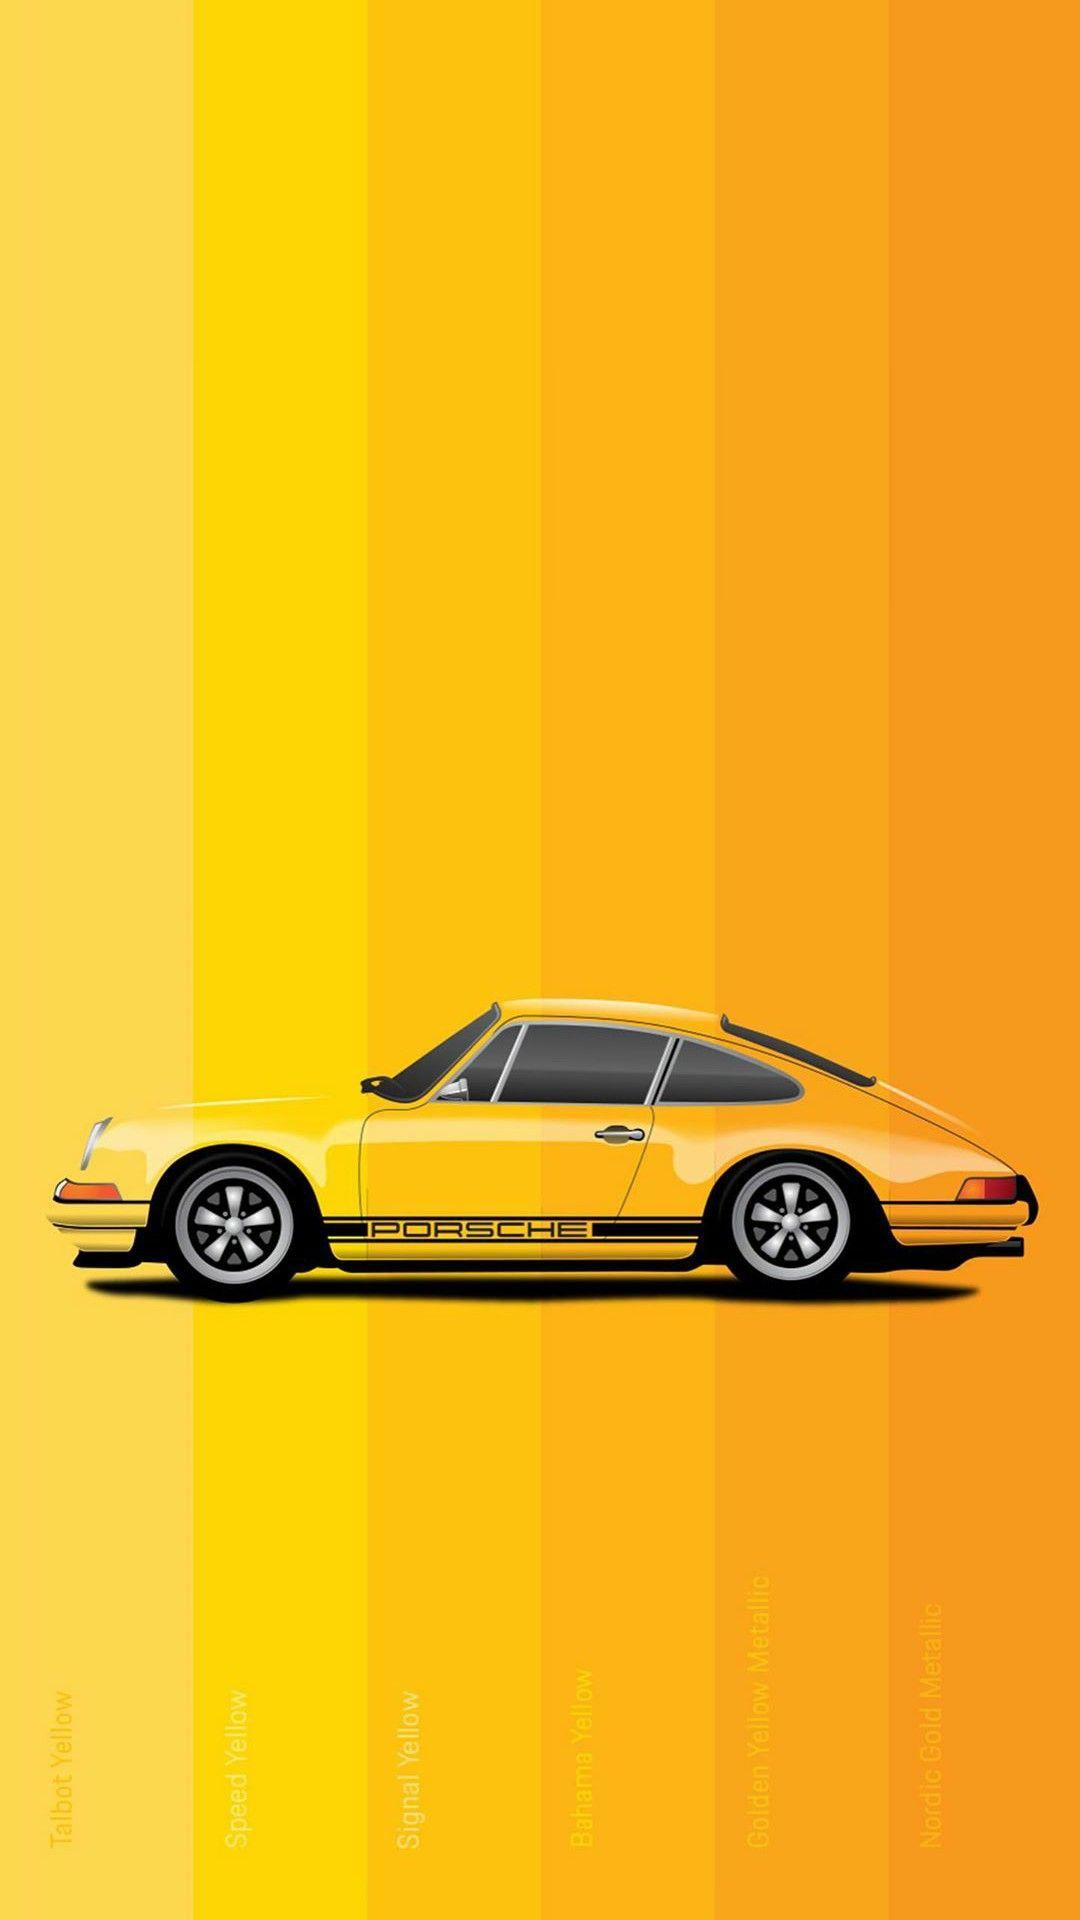 Yellow Porsche Wallpaper 1080x1920 Samsung Galaxy Wallpaper Wallpaper Samsung Wallpaper Android